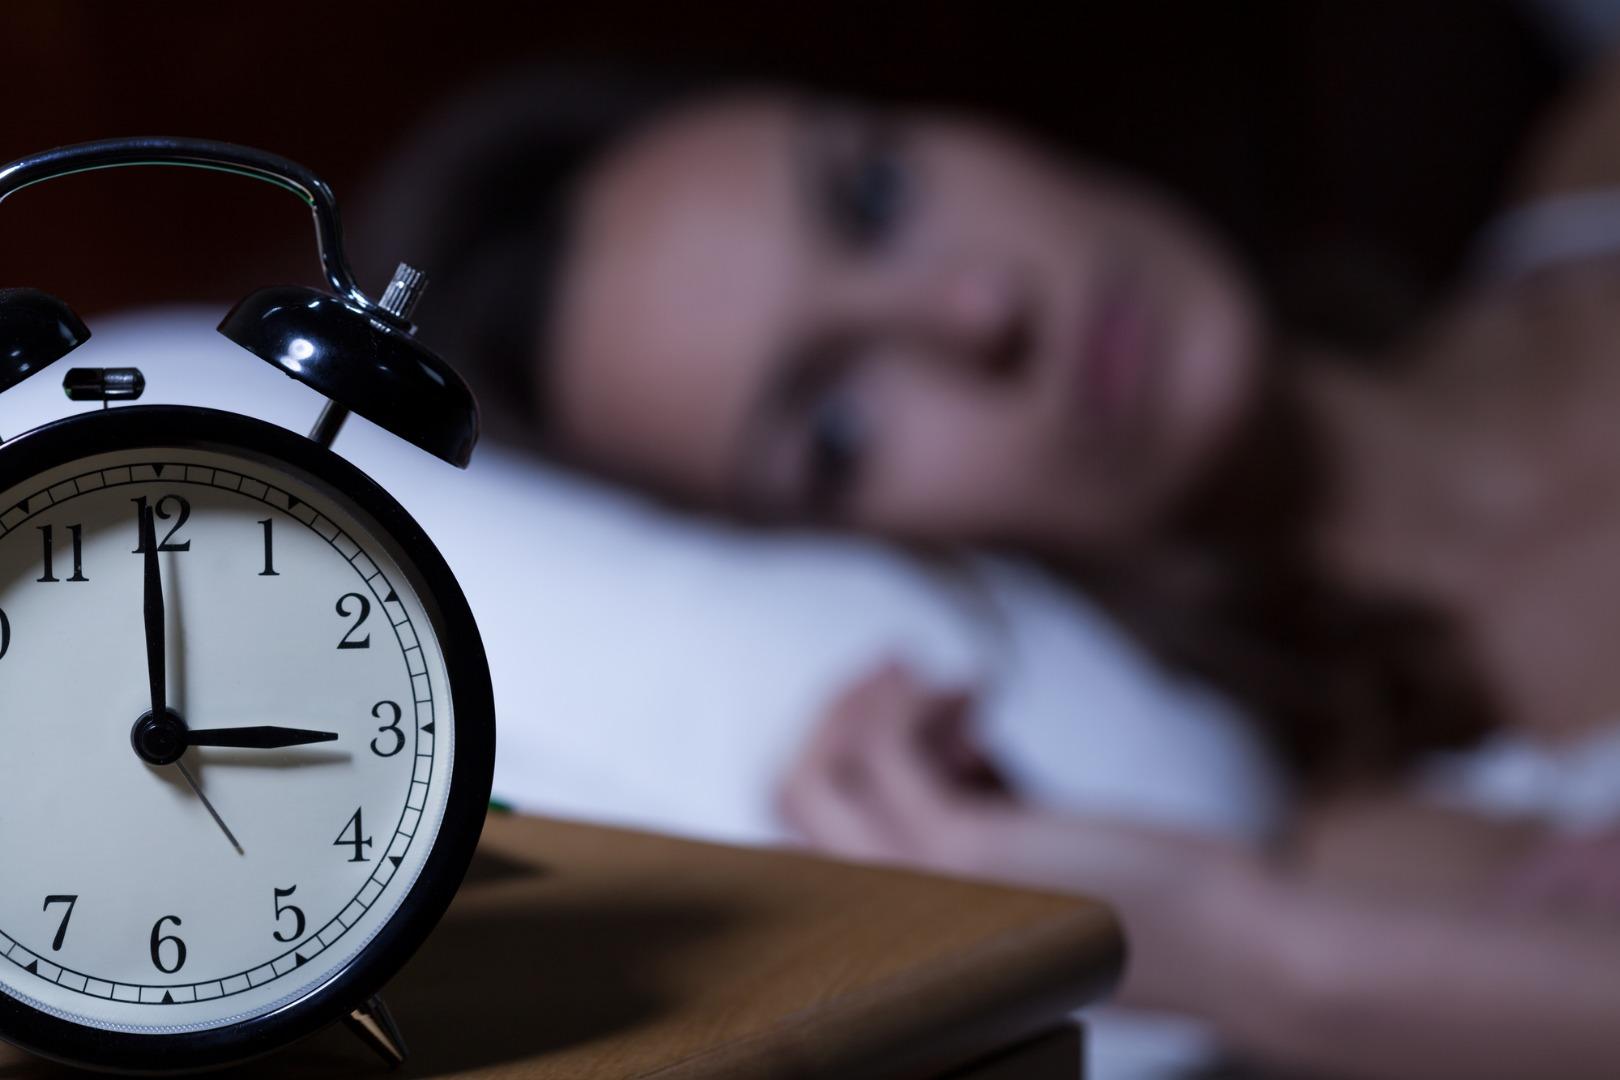 More evidence lack of sleep drives Alzheimer's progression